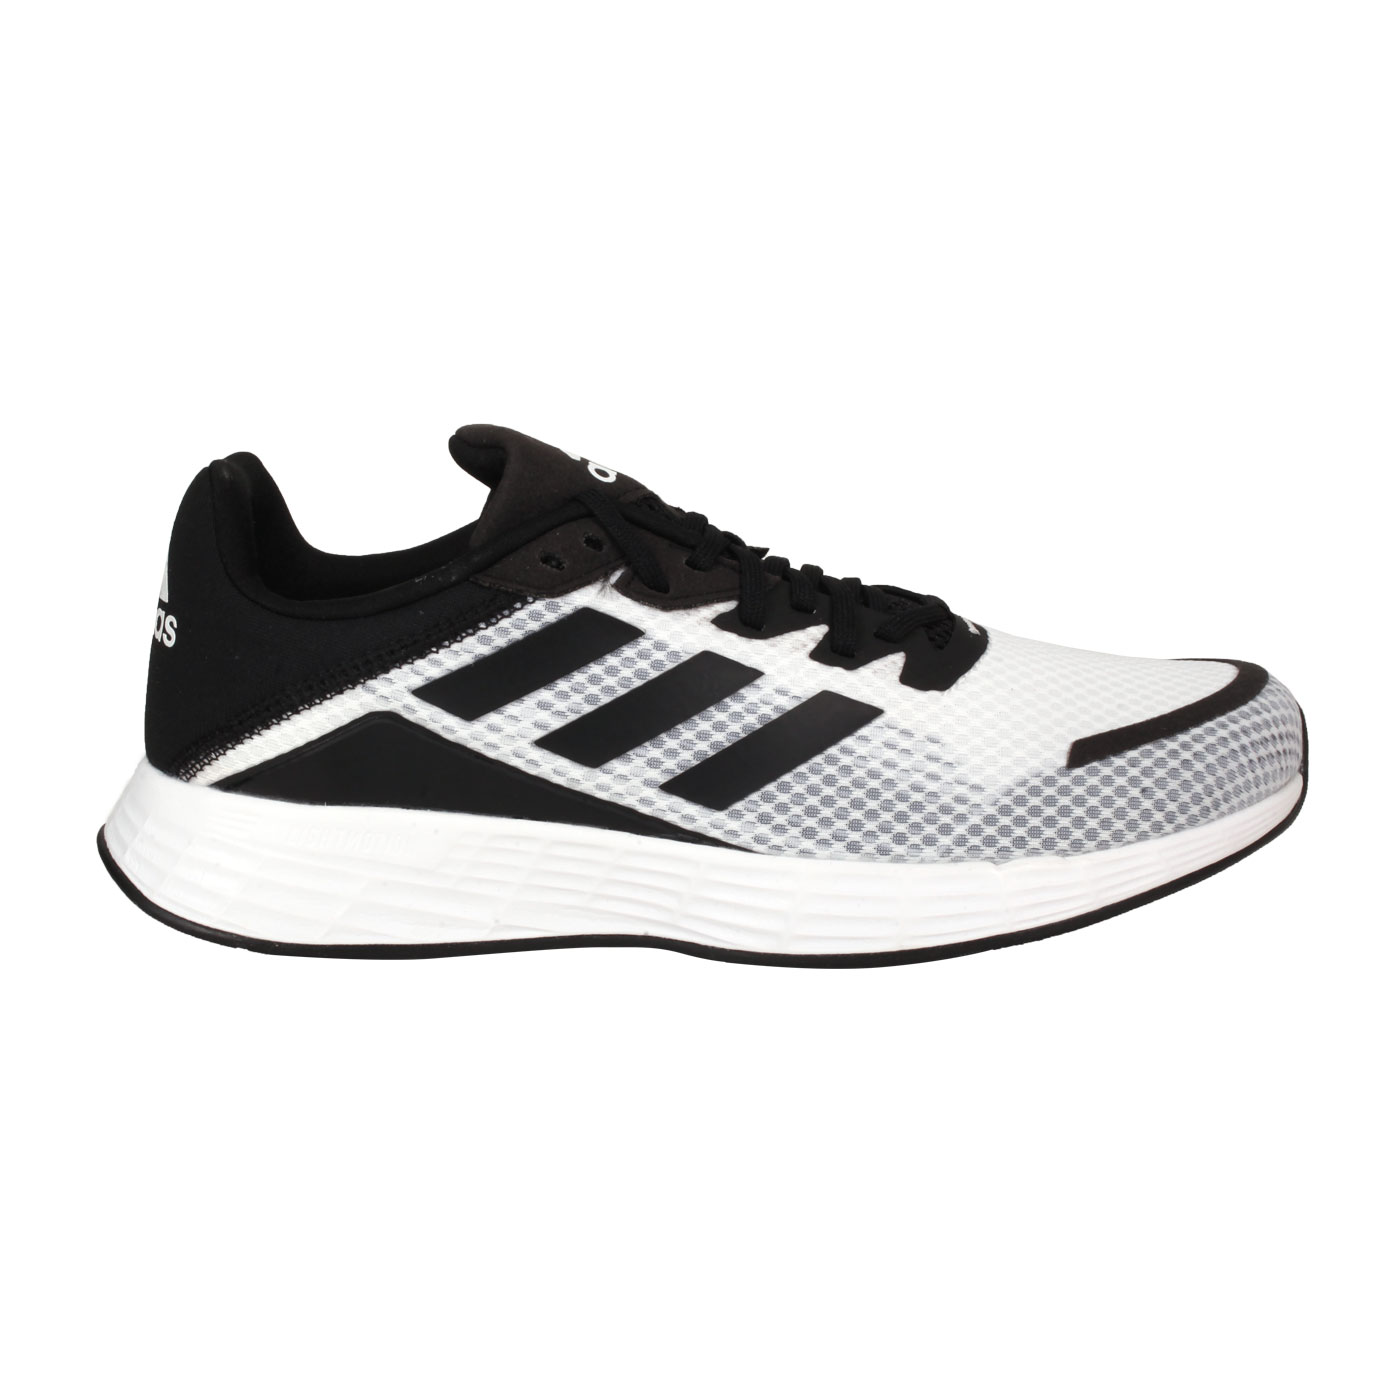 ADIDAS 男款休閒運動鞋  @DURAMO SL@FW7103